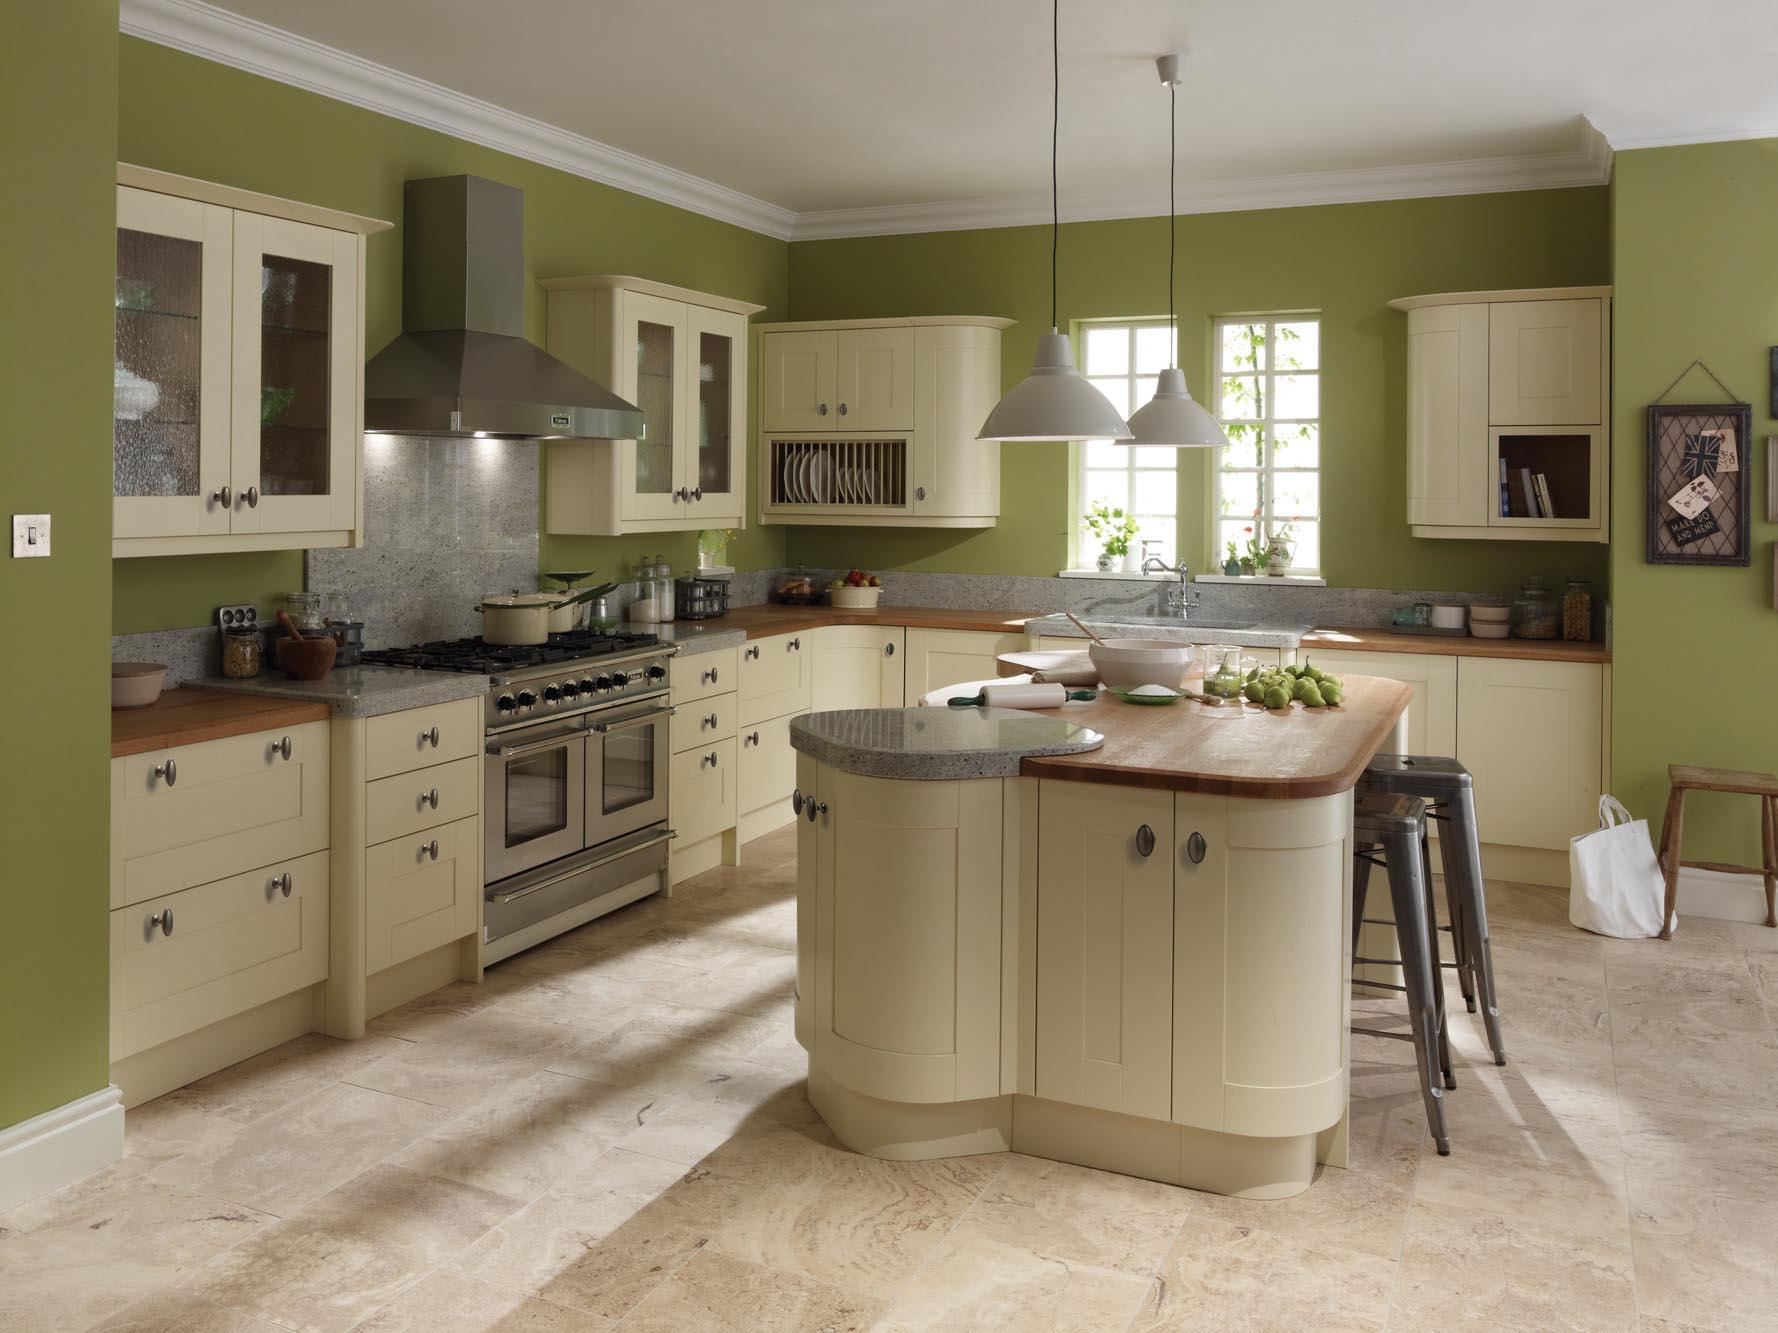 Mereway Kitchens Trend Range Available from Maurice Prewett in Corsham